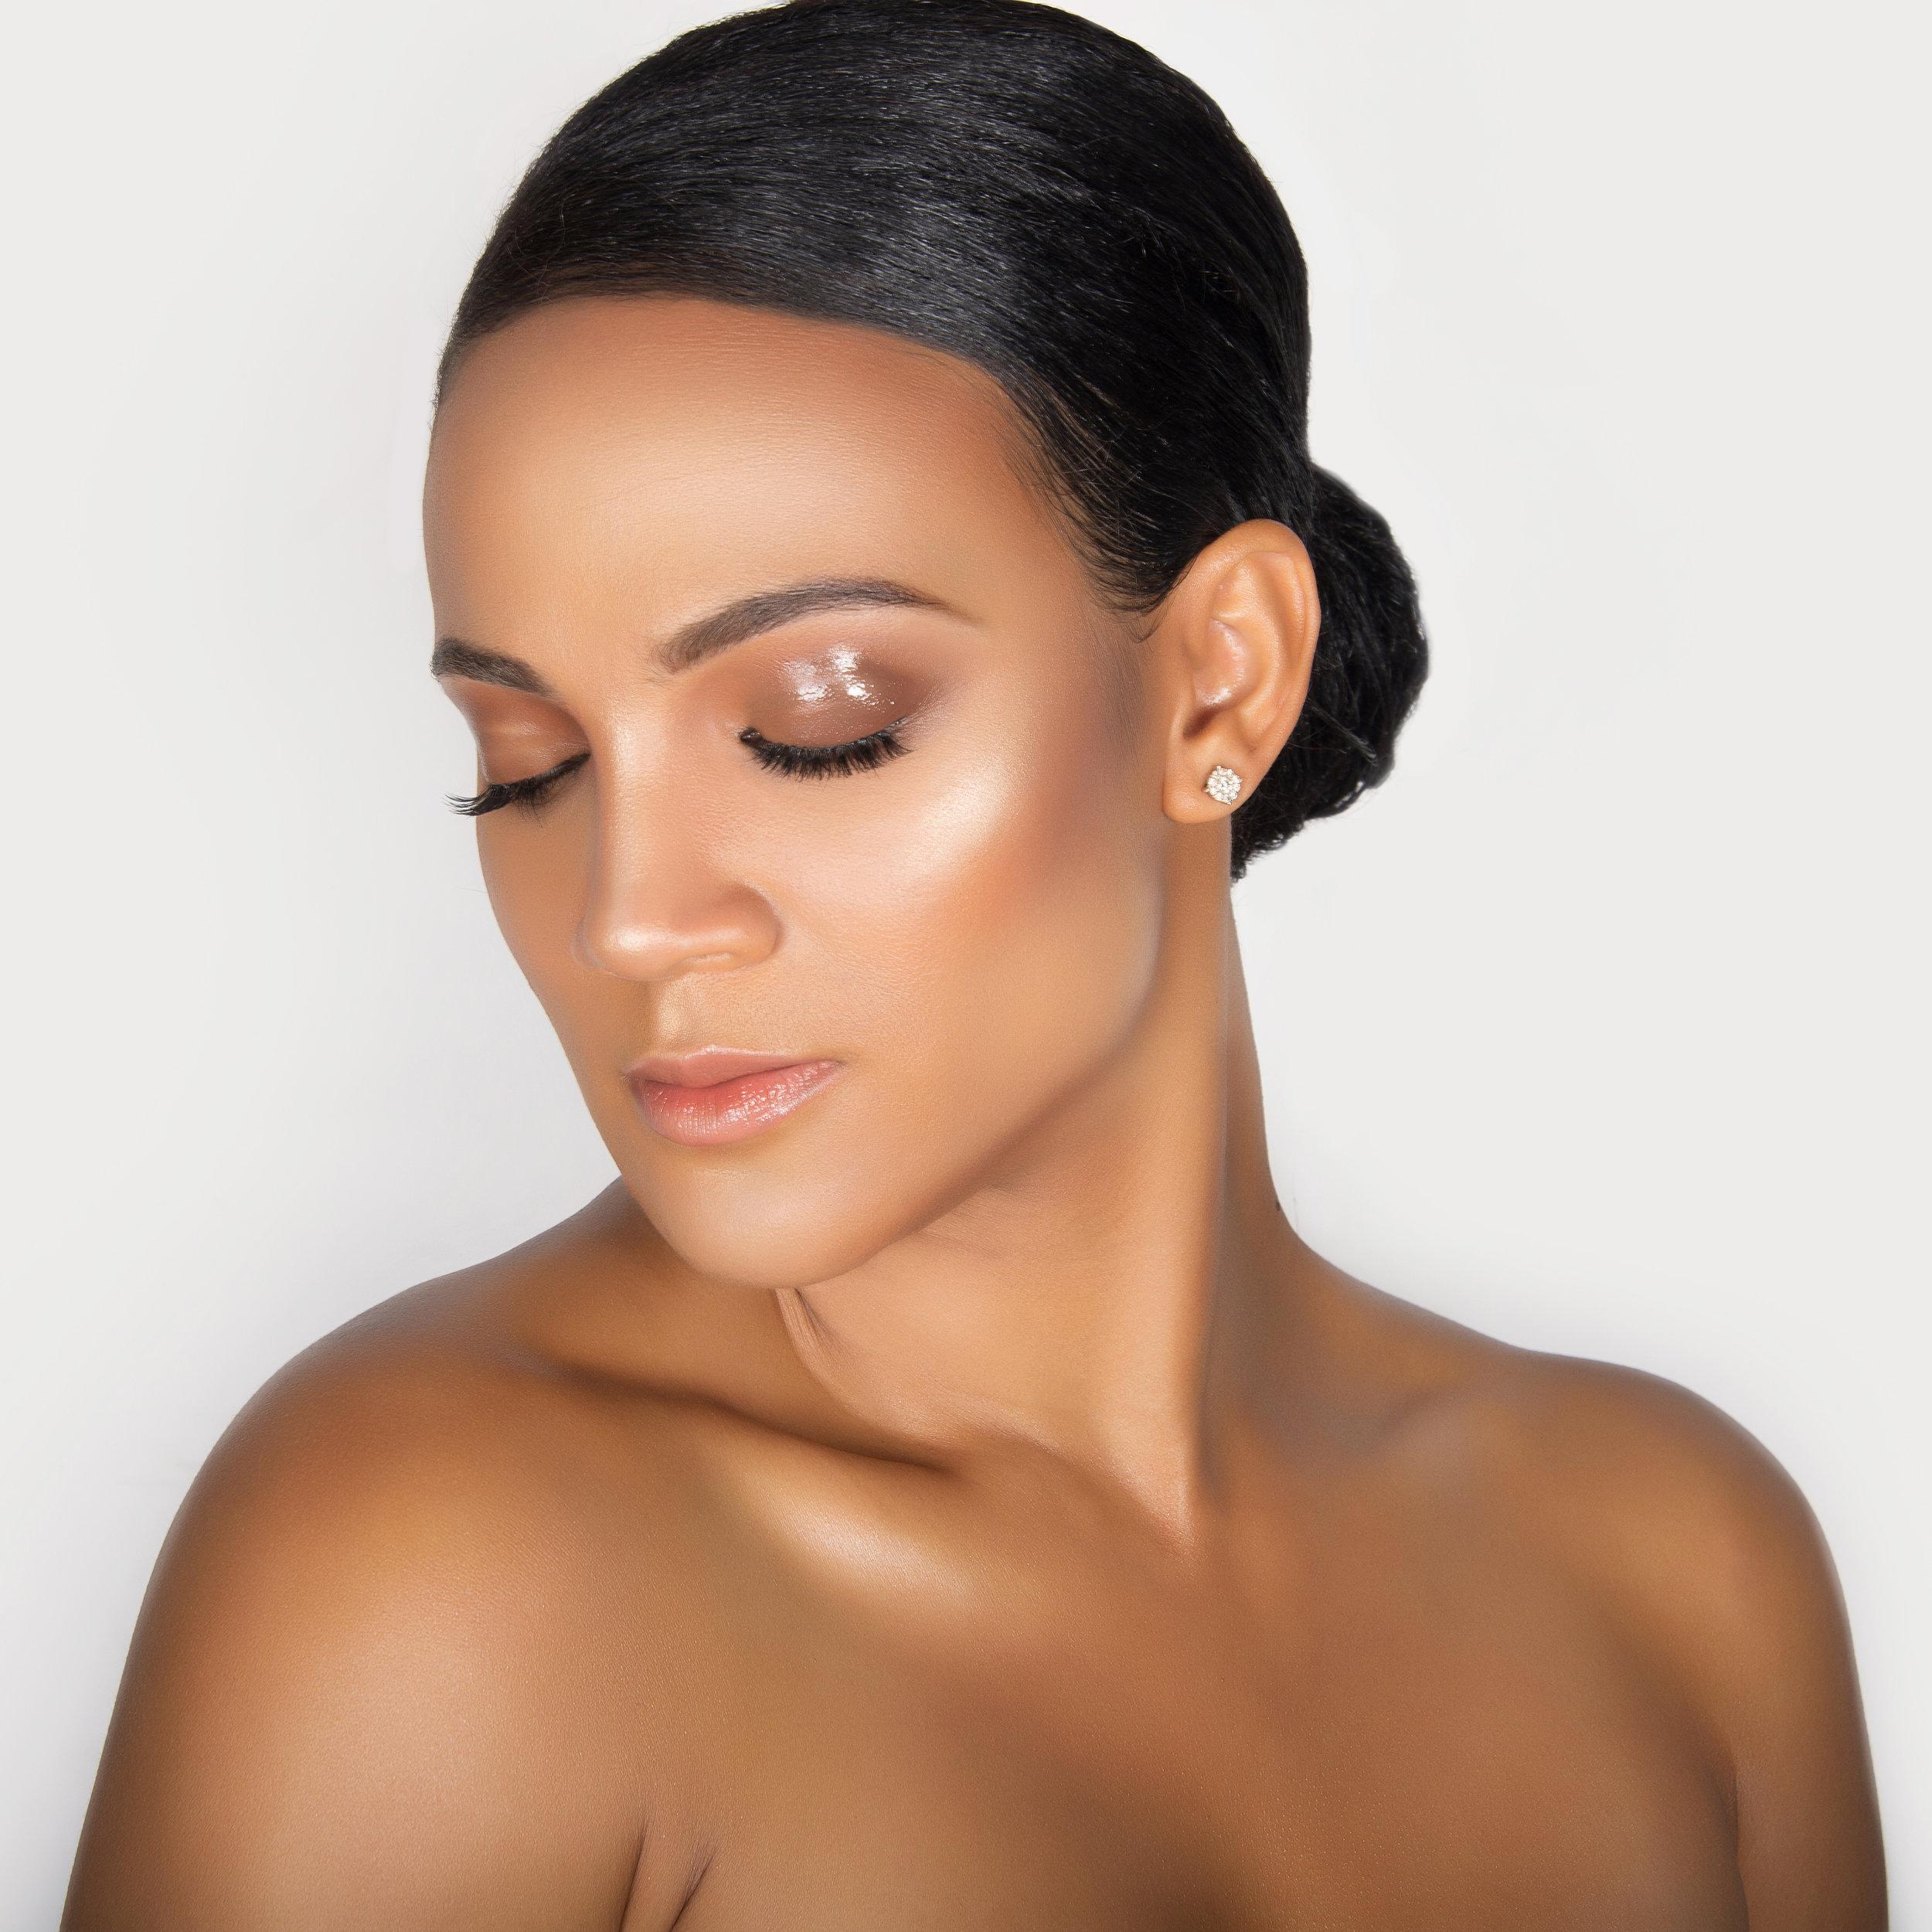 Xiannie Profile